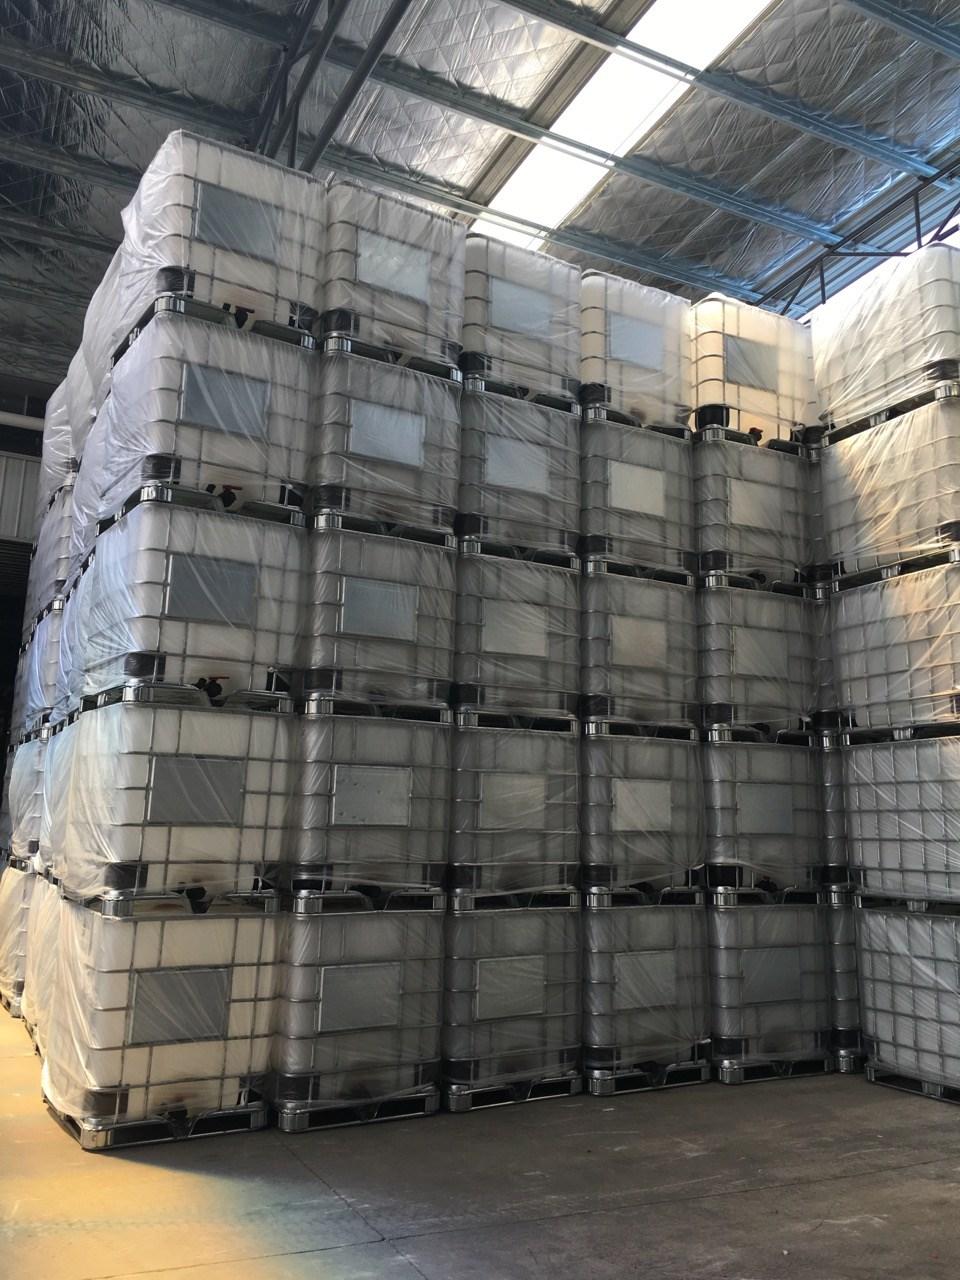 1000l ibc tanks buy hdpe ibc tank 1000l for chemicals plastic ibc tanks 1000l intermediate. Black Bedroom Furniture Sets. Home Design Ideas